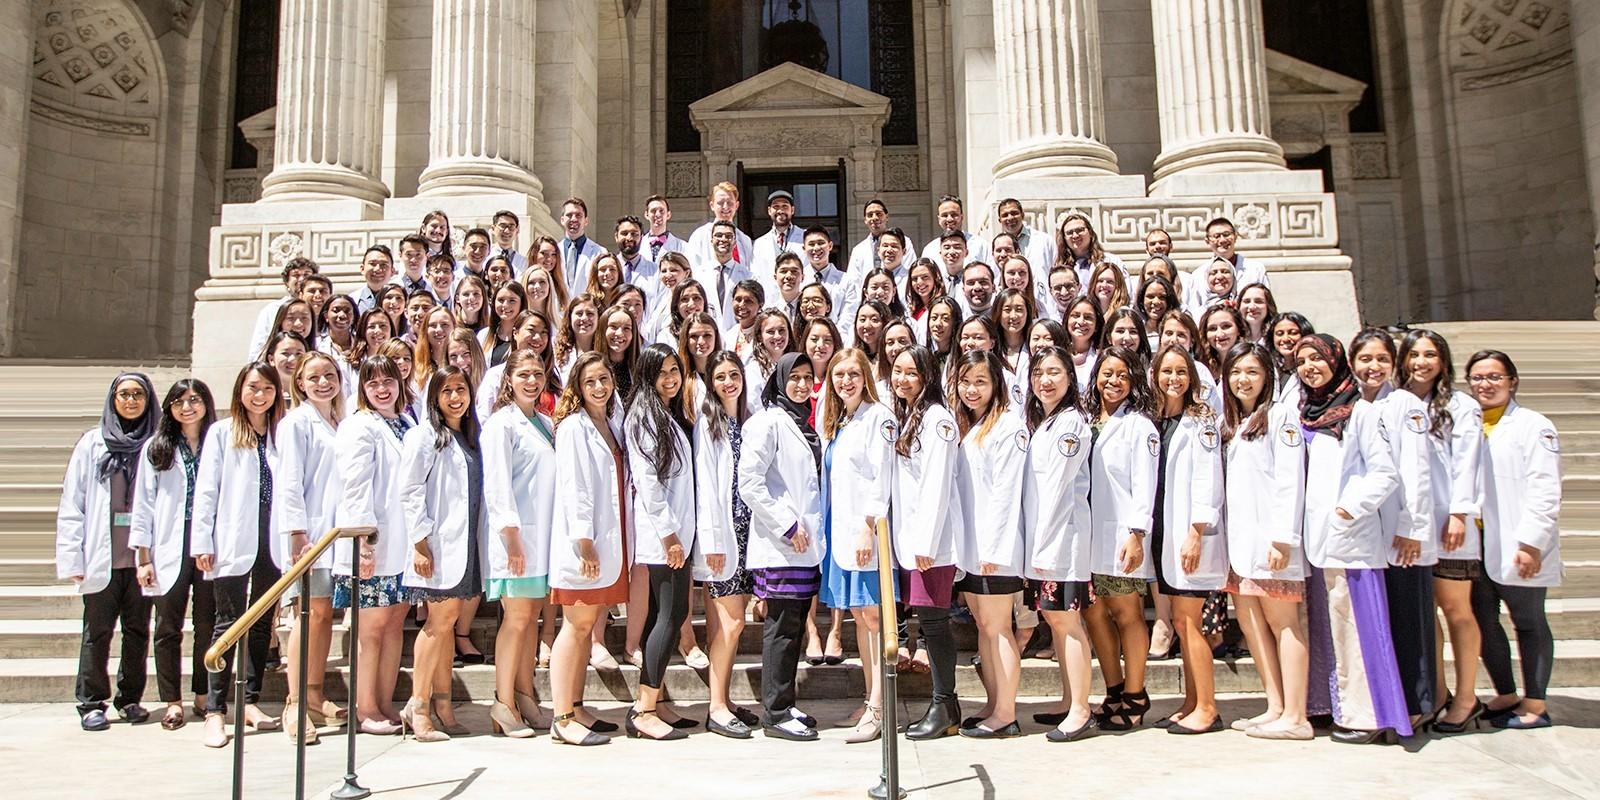 State University of New York College of Optometry | LinkedIn